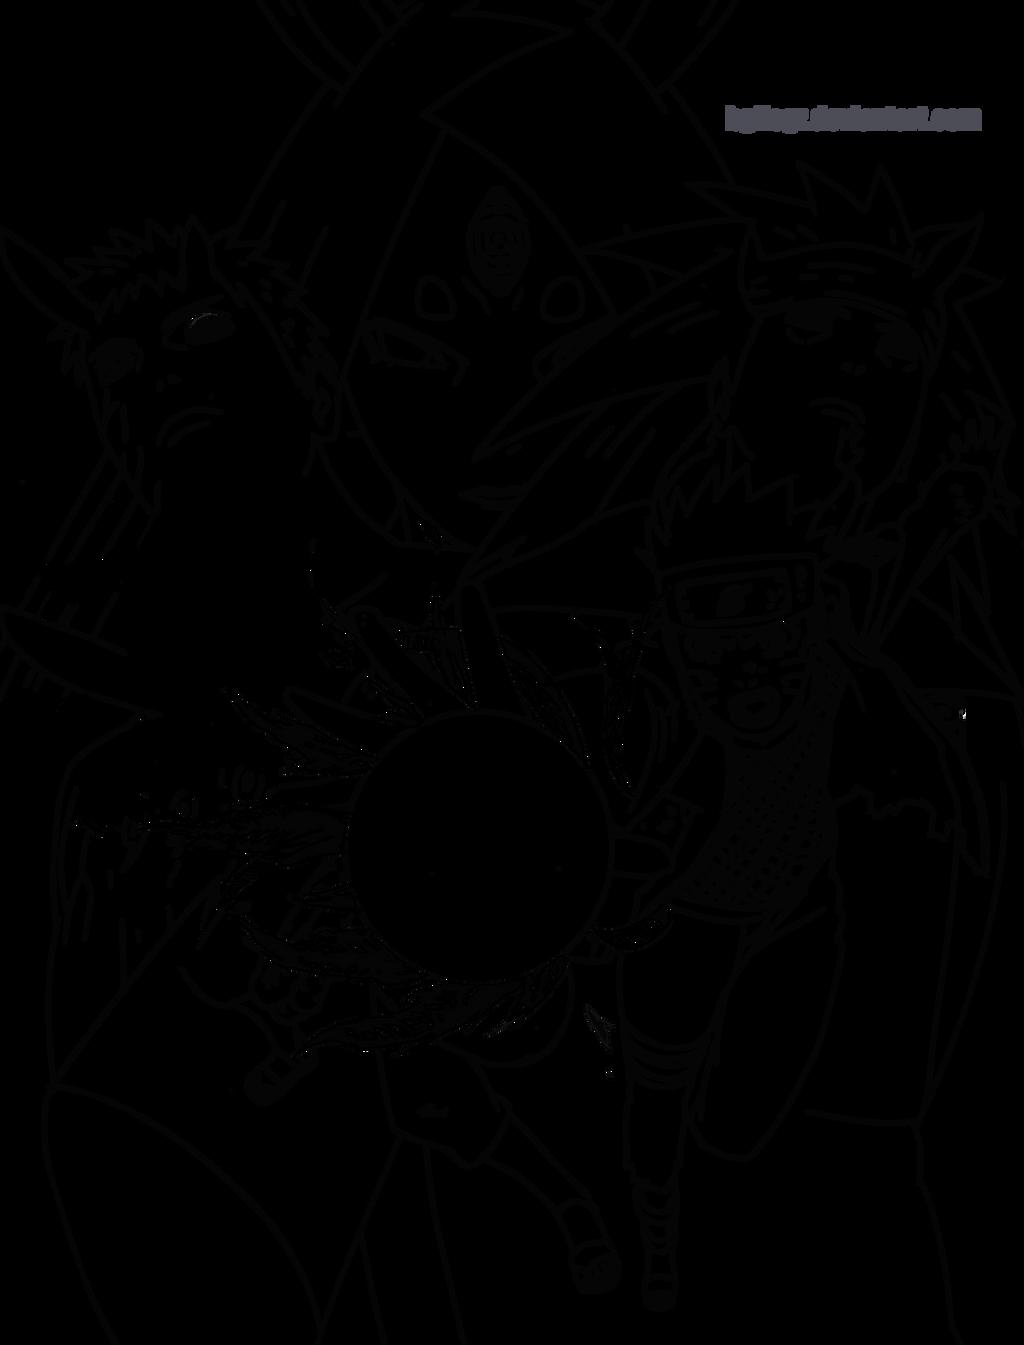 Naruto Lineart : Naruto storm lineart by bgflegz on deviantart